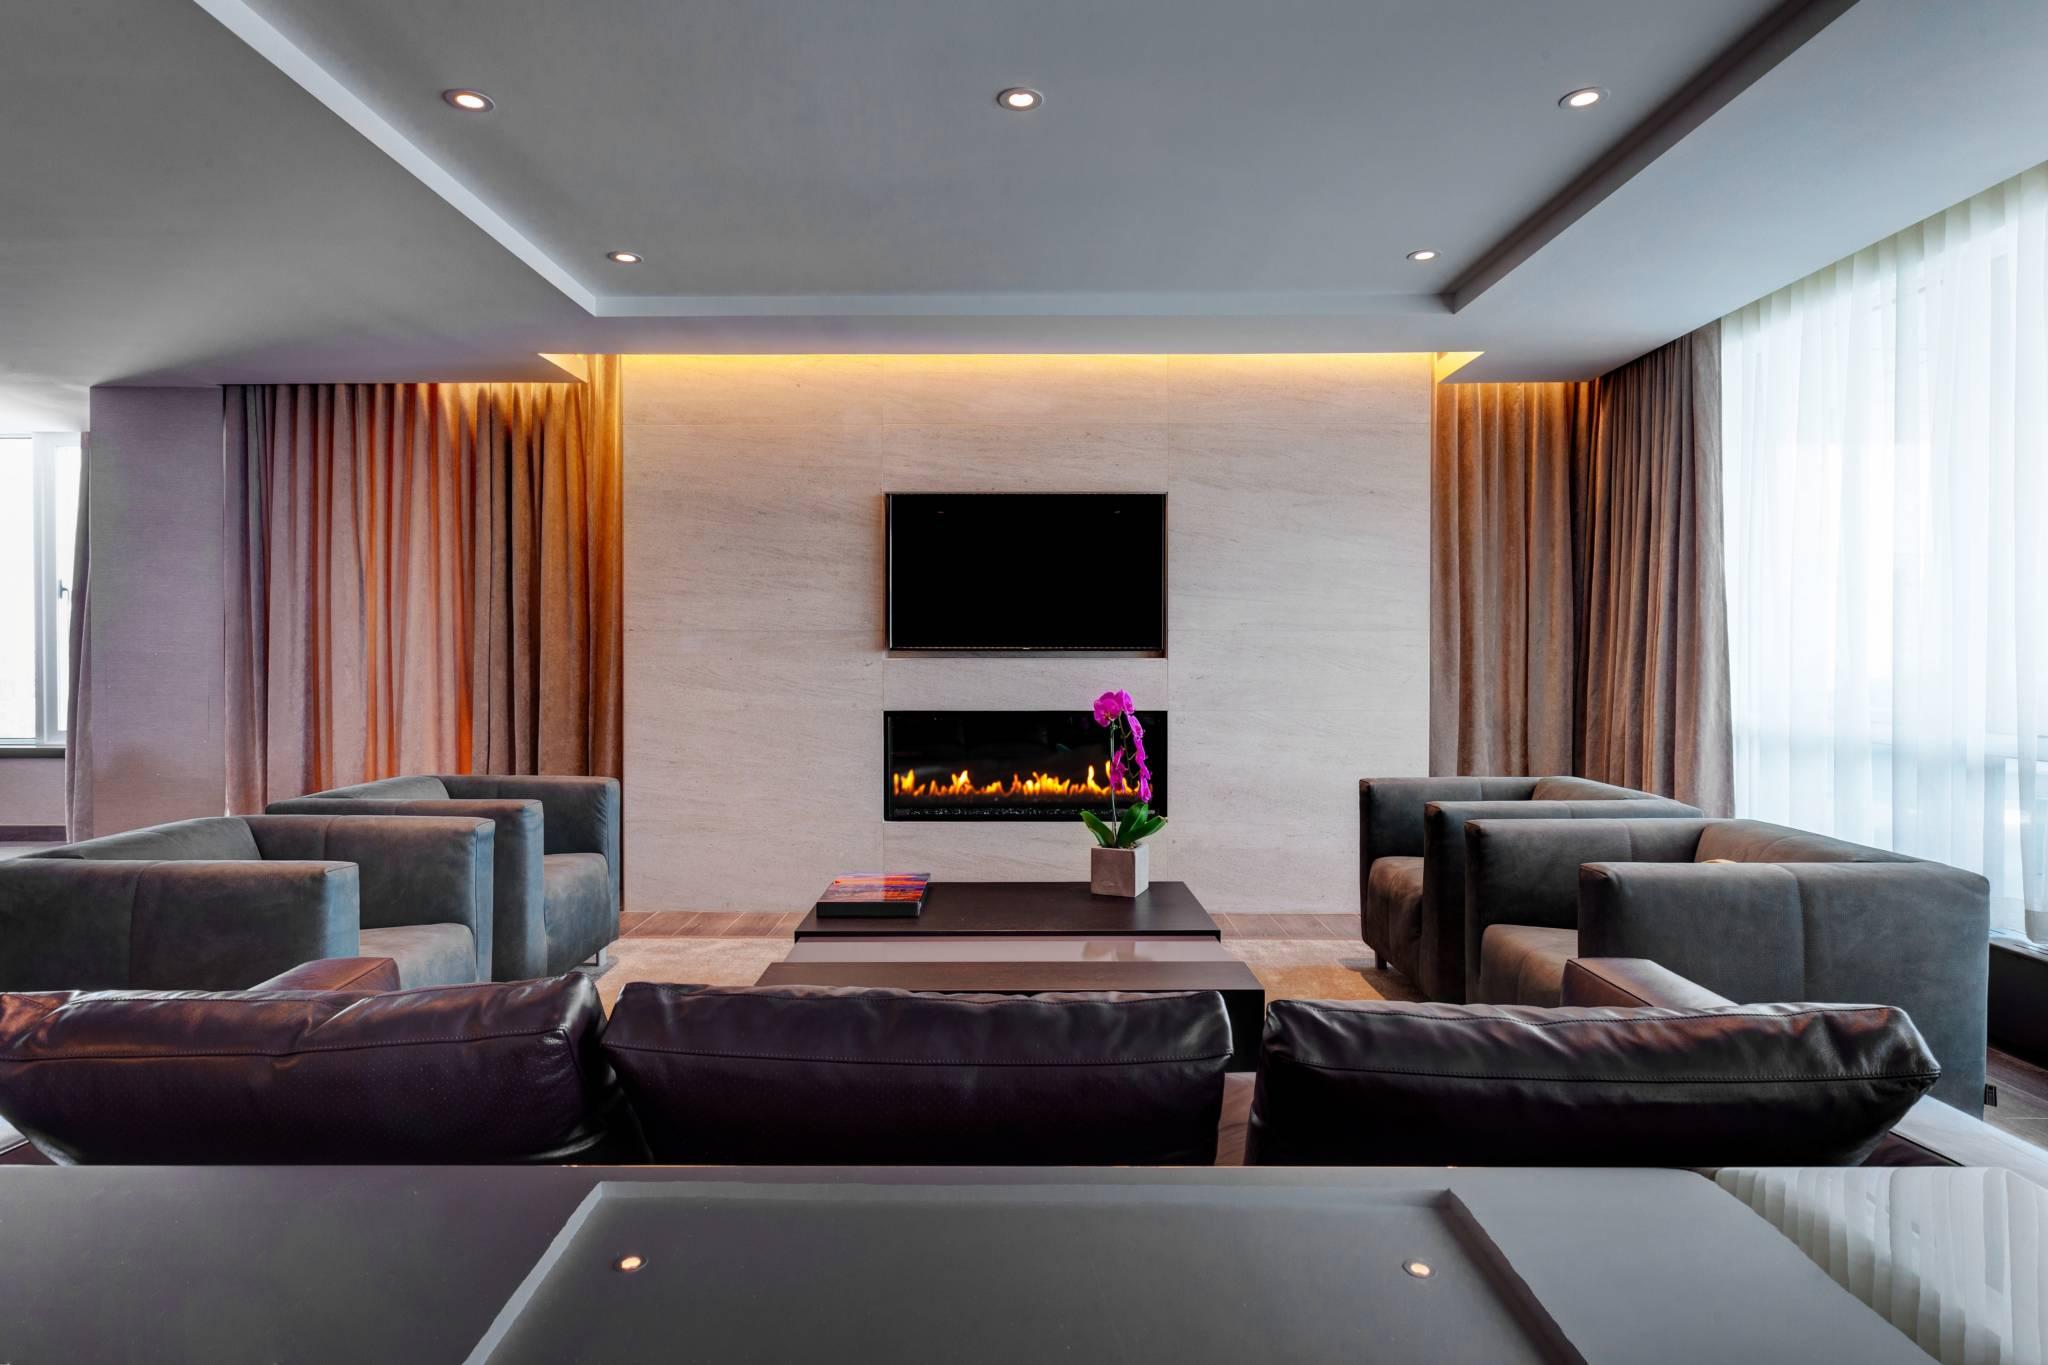 6000 a night toronto hotel x 7